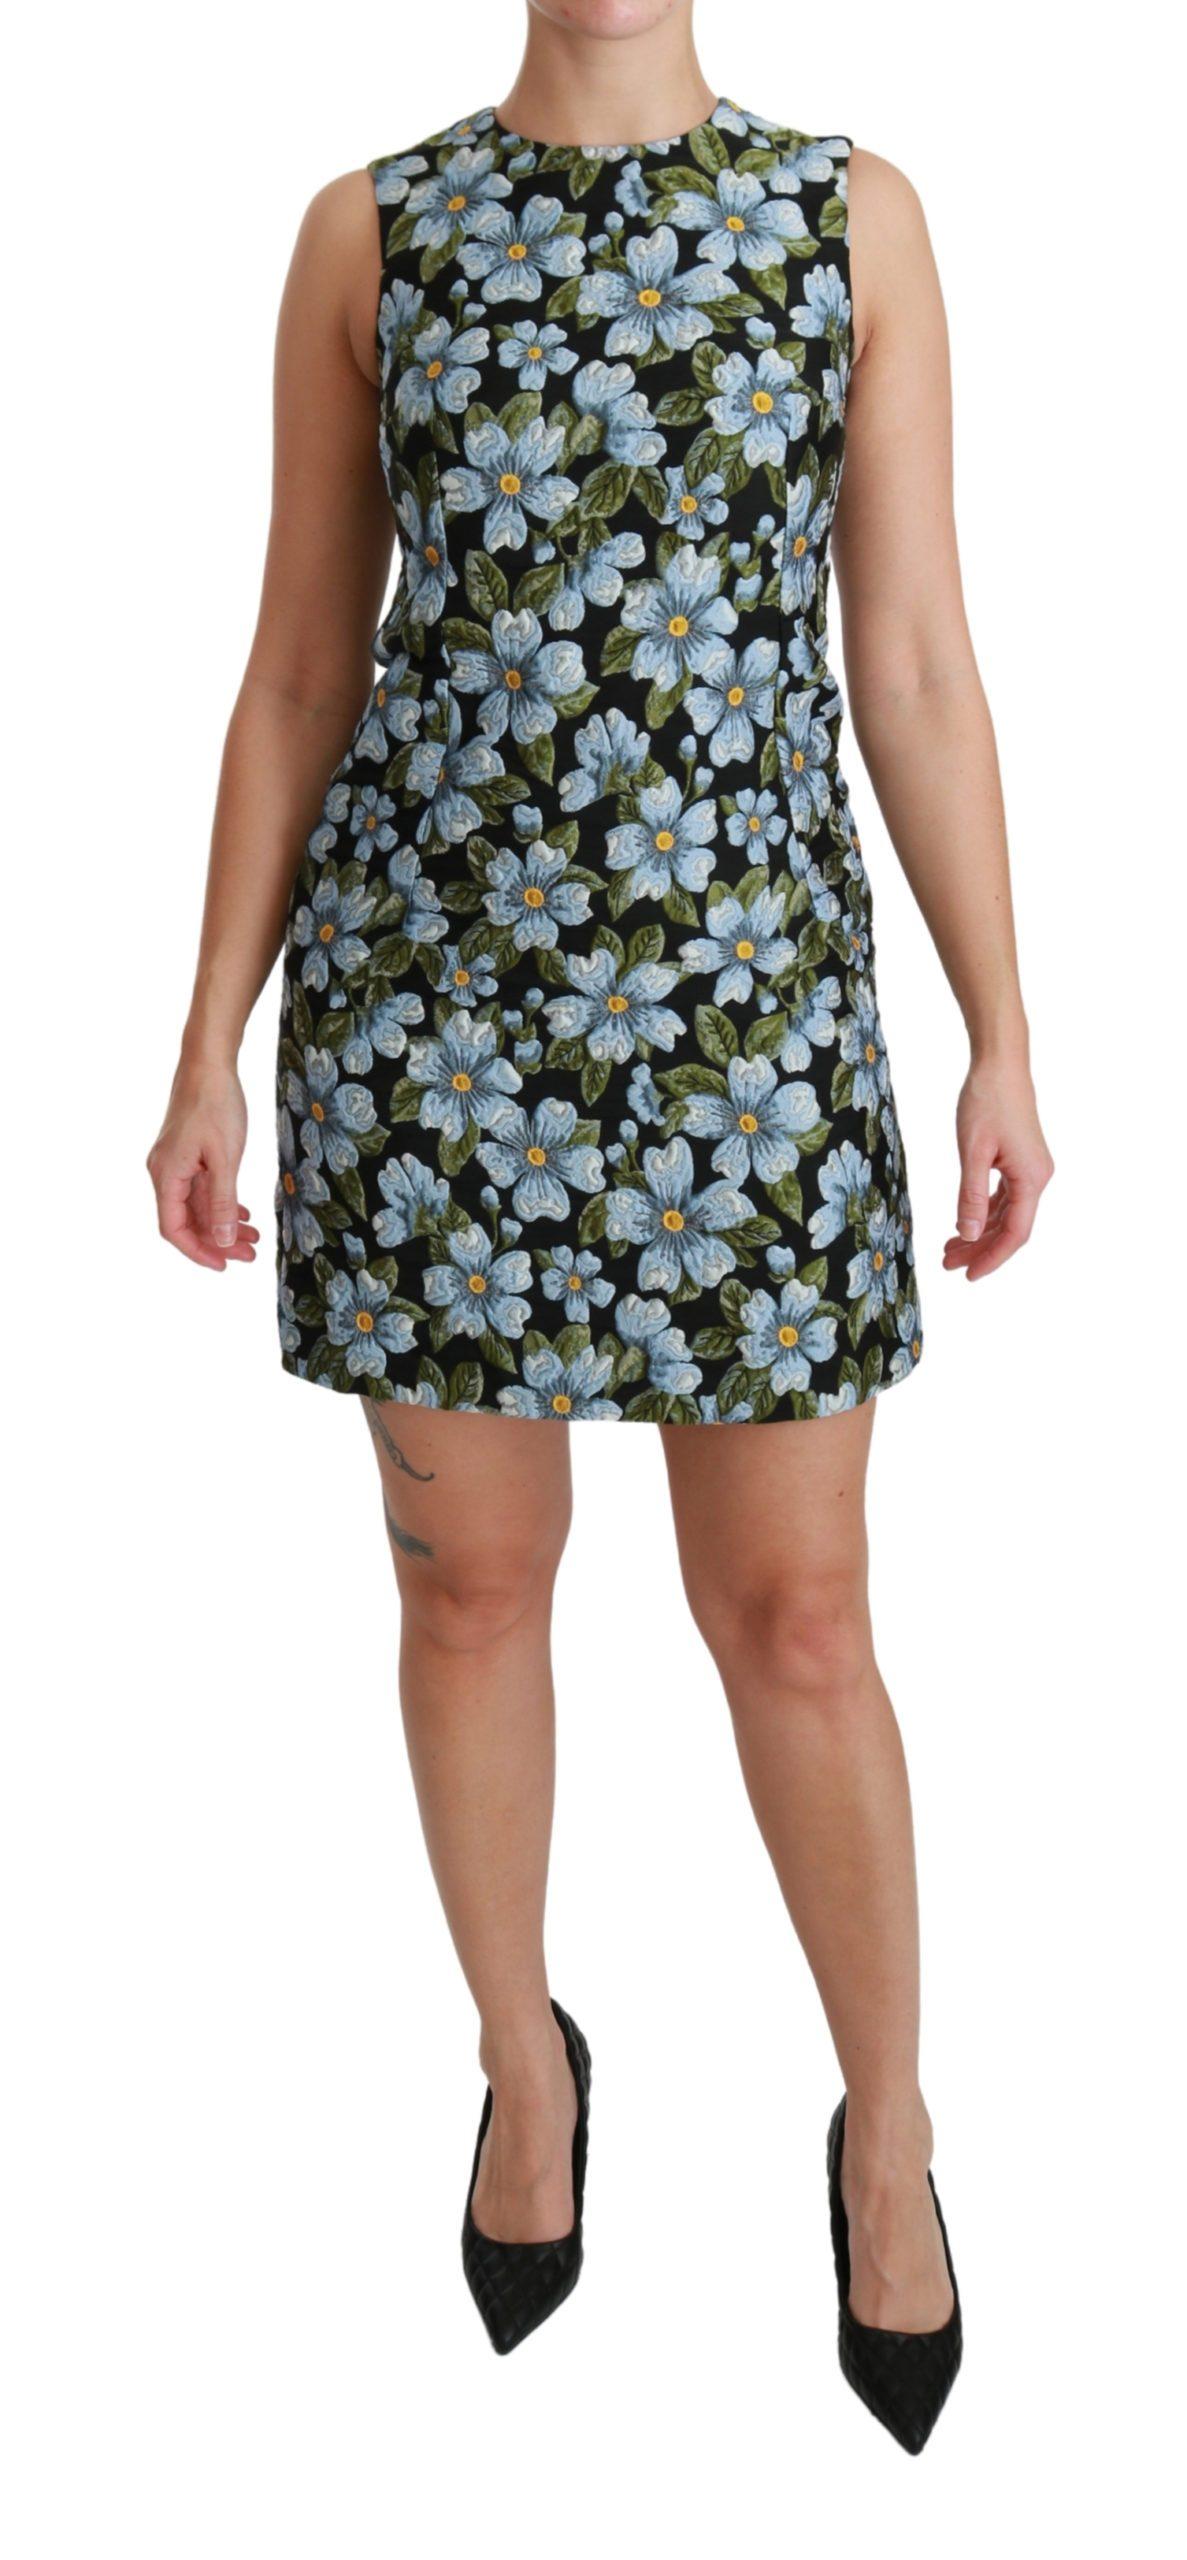 Dolce & Gabbana Women's Floral Brocade Gown Shift Dress Multicolor DR2513 - IT36 | XS